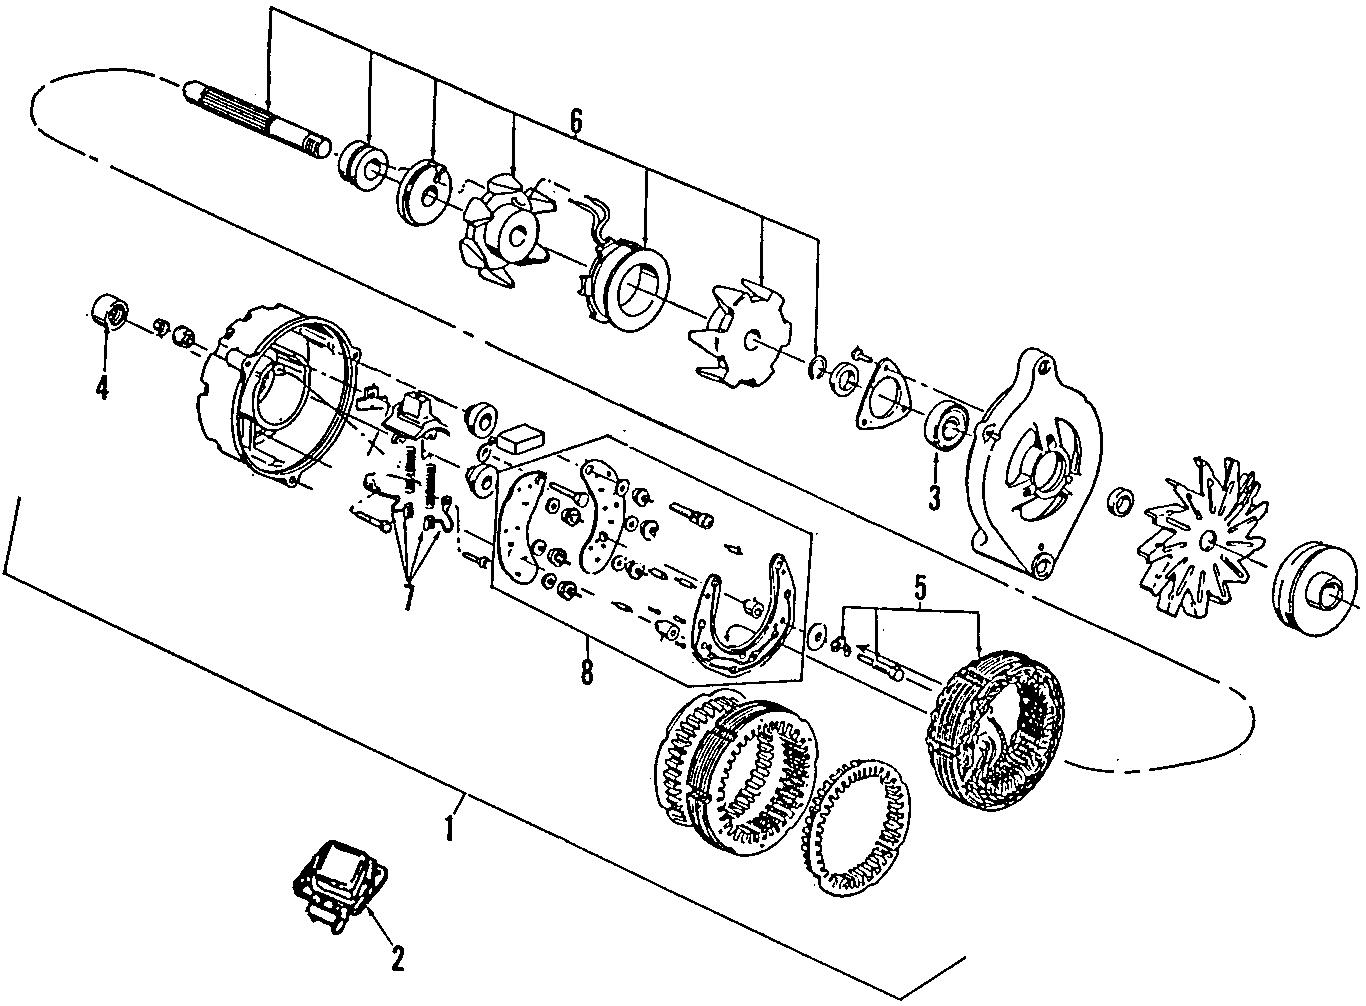 ford alternator parts diagram 4u2z10v346cxrm    ford       alternator    lakeland    ford    online  4u2z10v346cxrm    ford       alternator    lakeland    ford    online